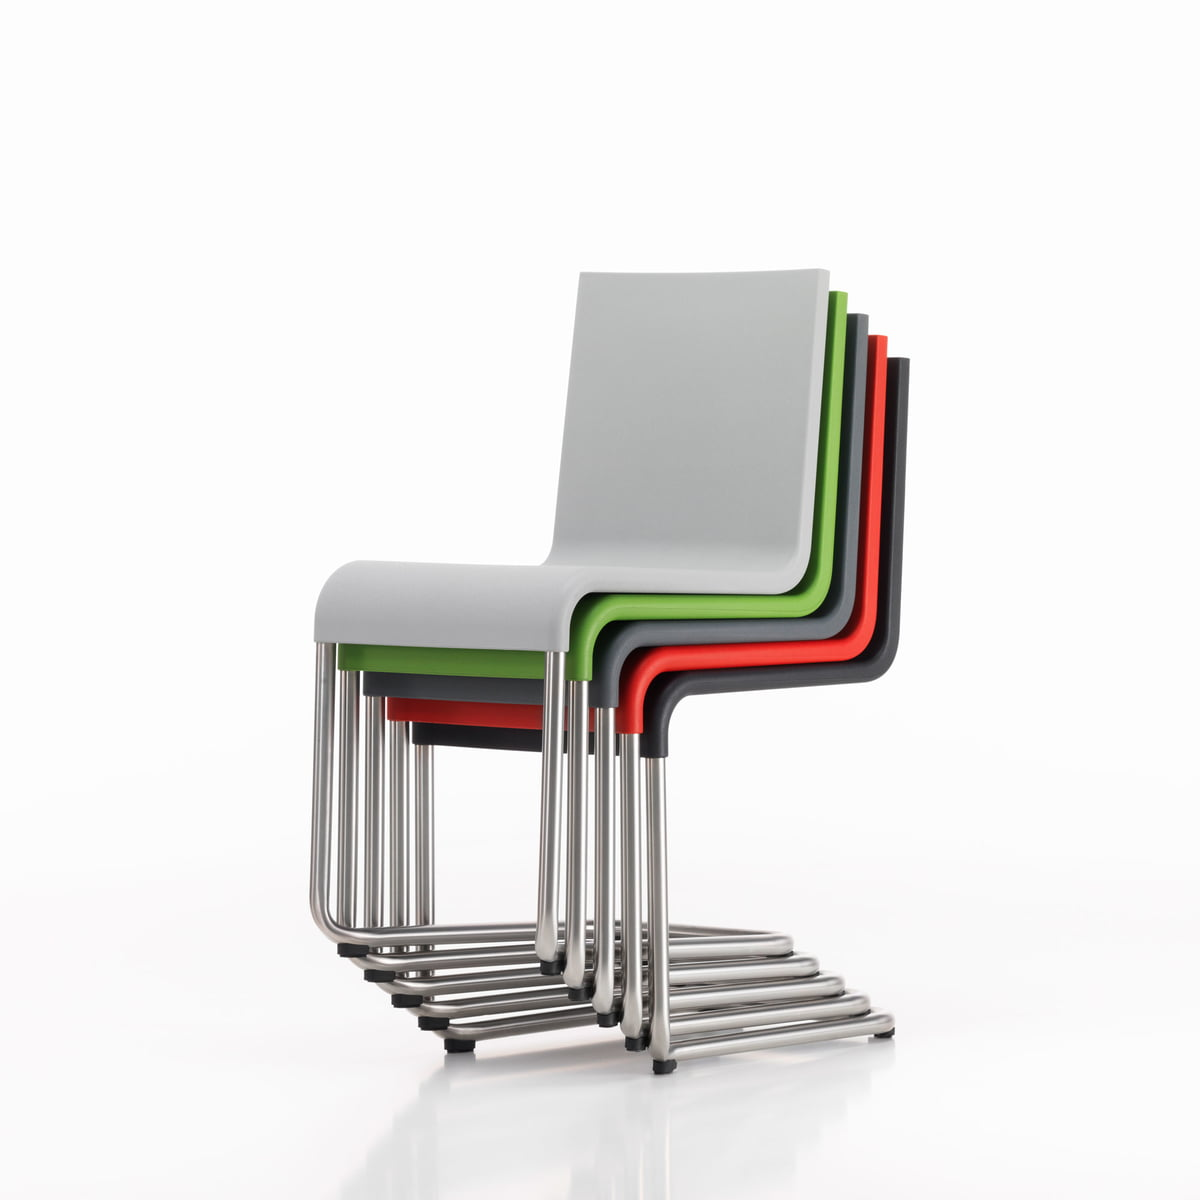 05 Stuhl von Vitra   Connox